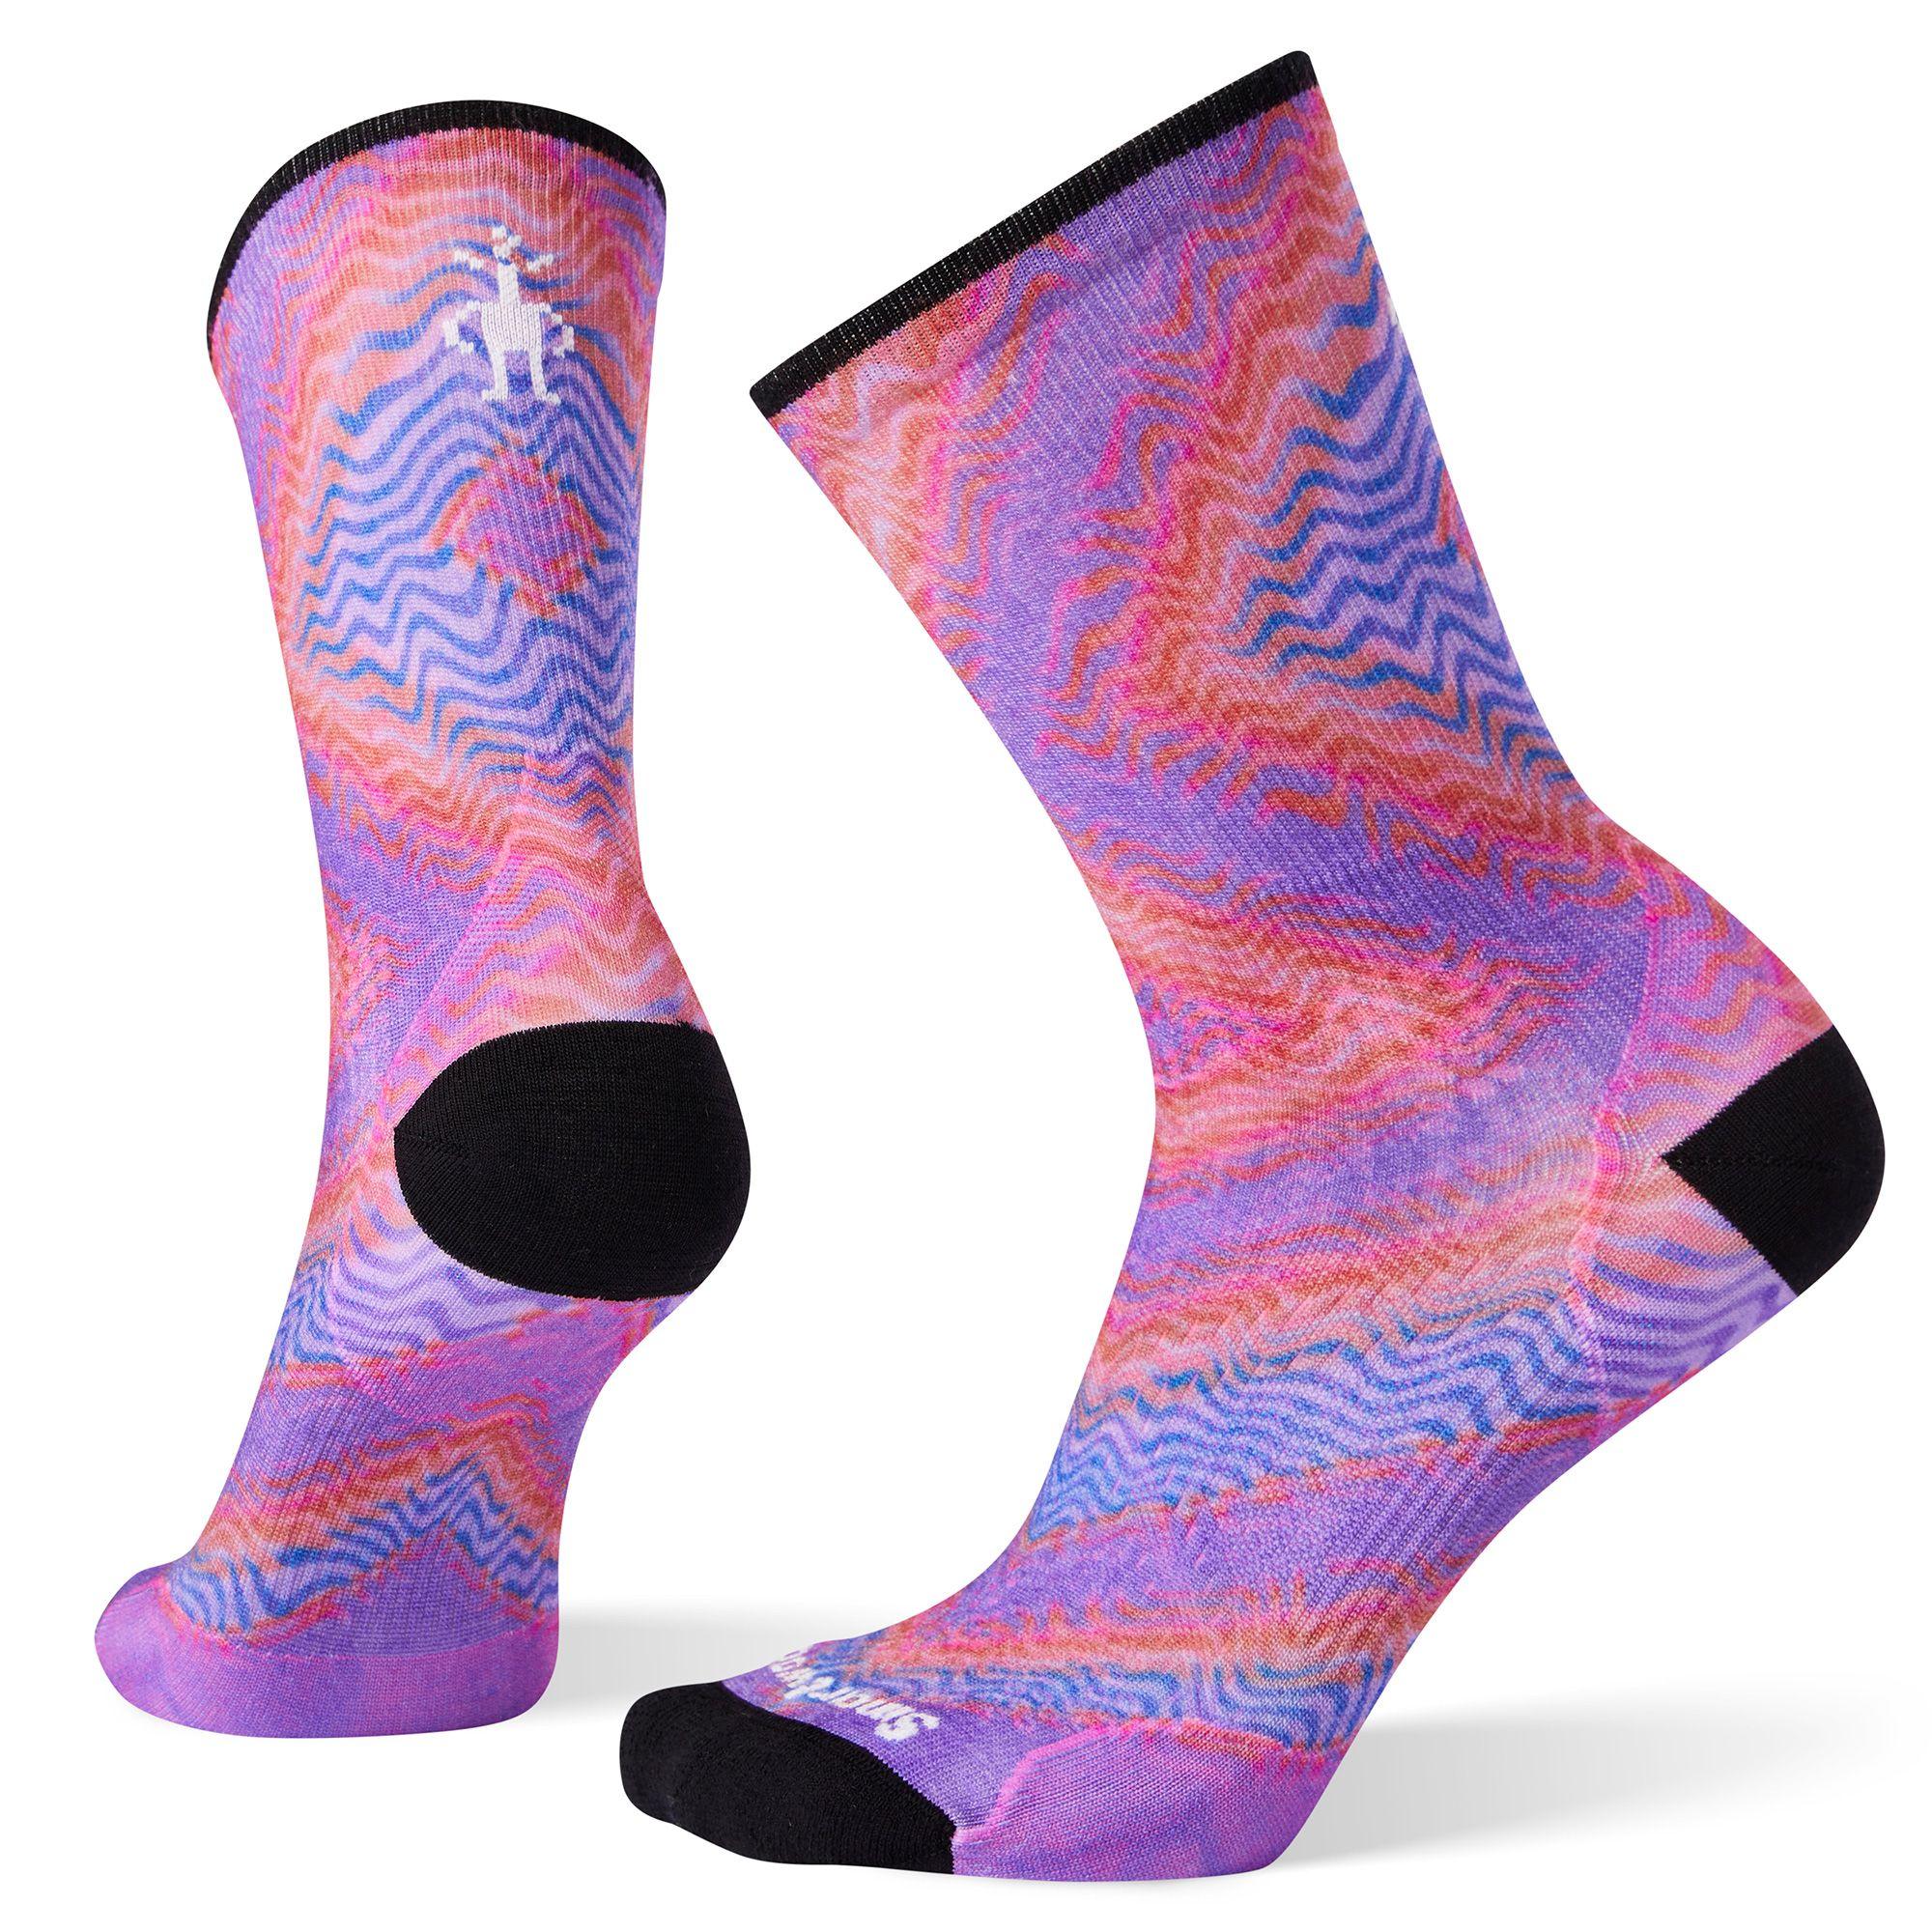 Chaussette imprimée PhD® Run Ultra Light pour femmes